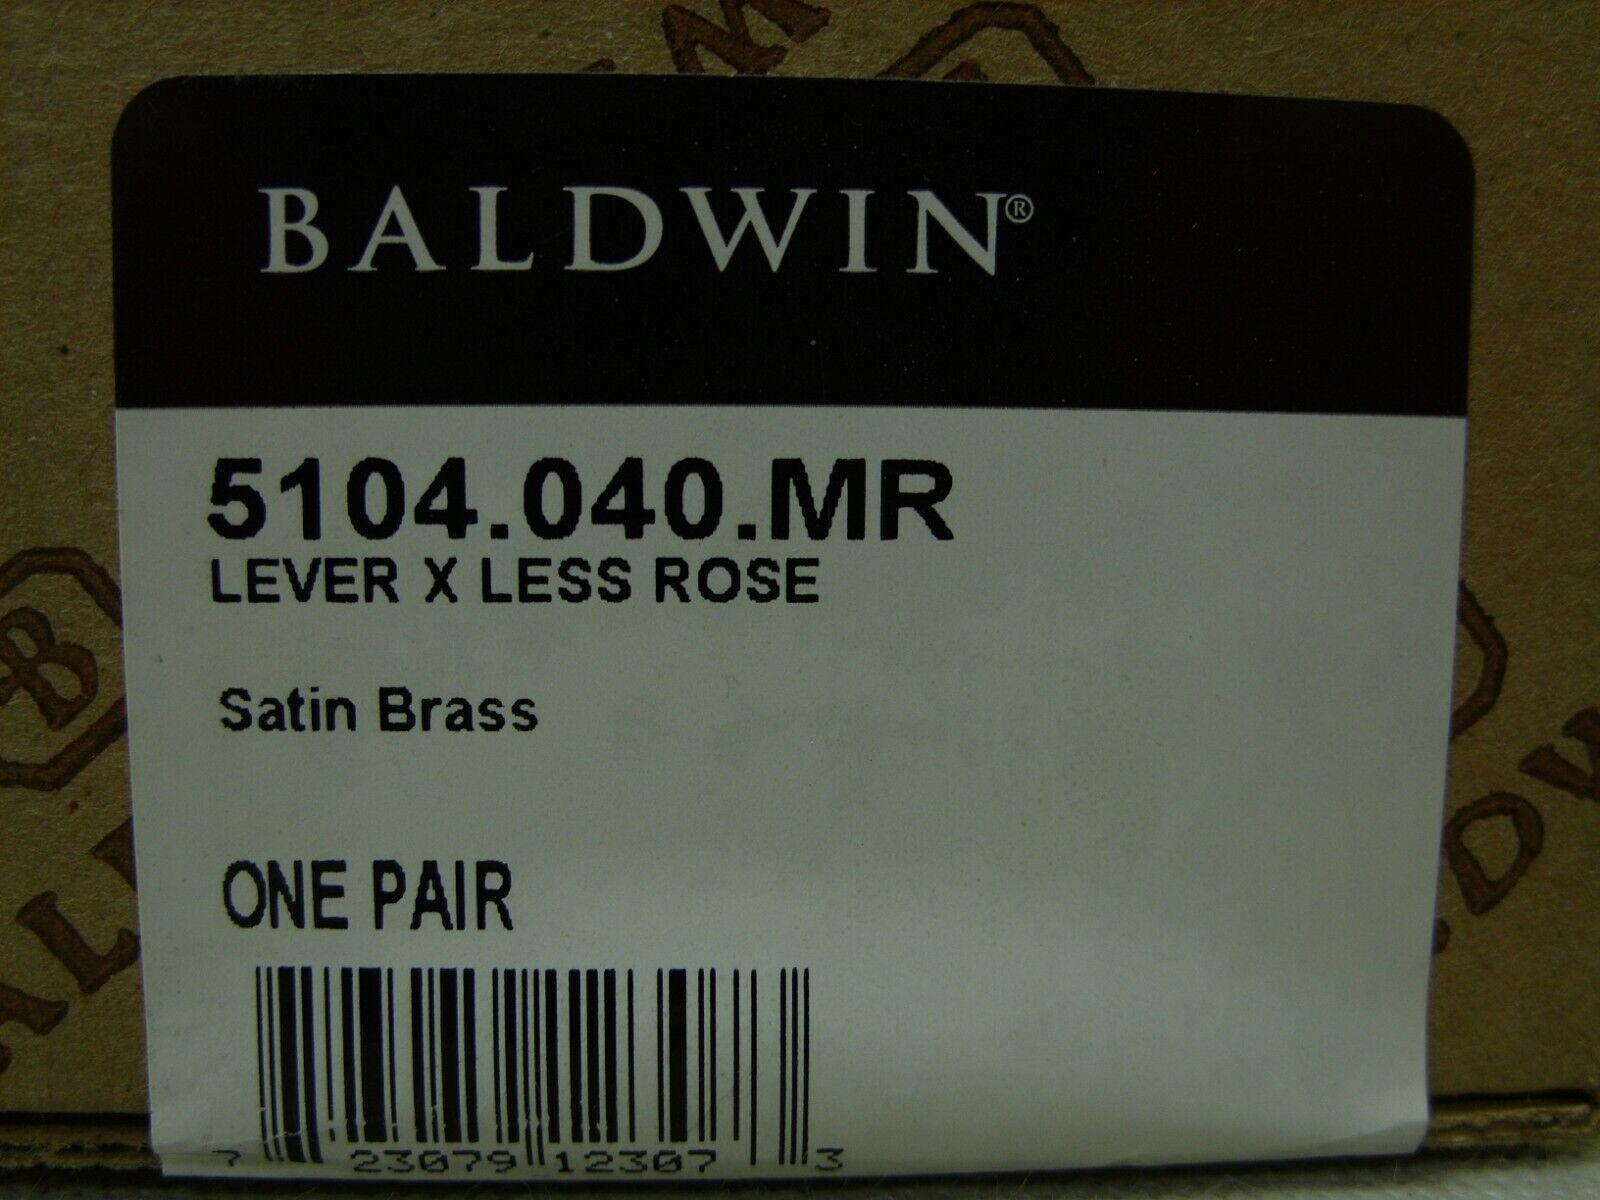 Baldwin Kunstvoll Estate Hebel Weniger Rosa - Satin Messing - 5104.040.mr - Full | Elegante und robuste Verpackung